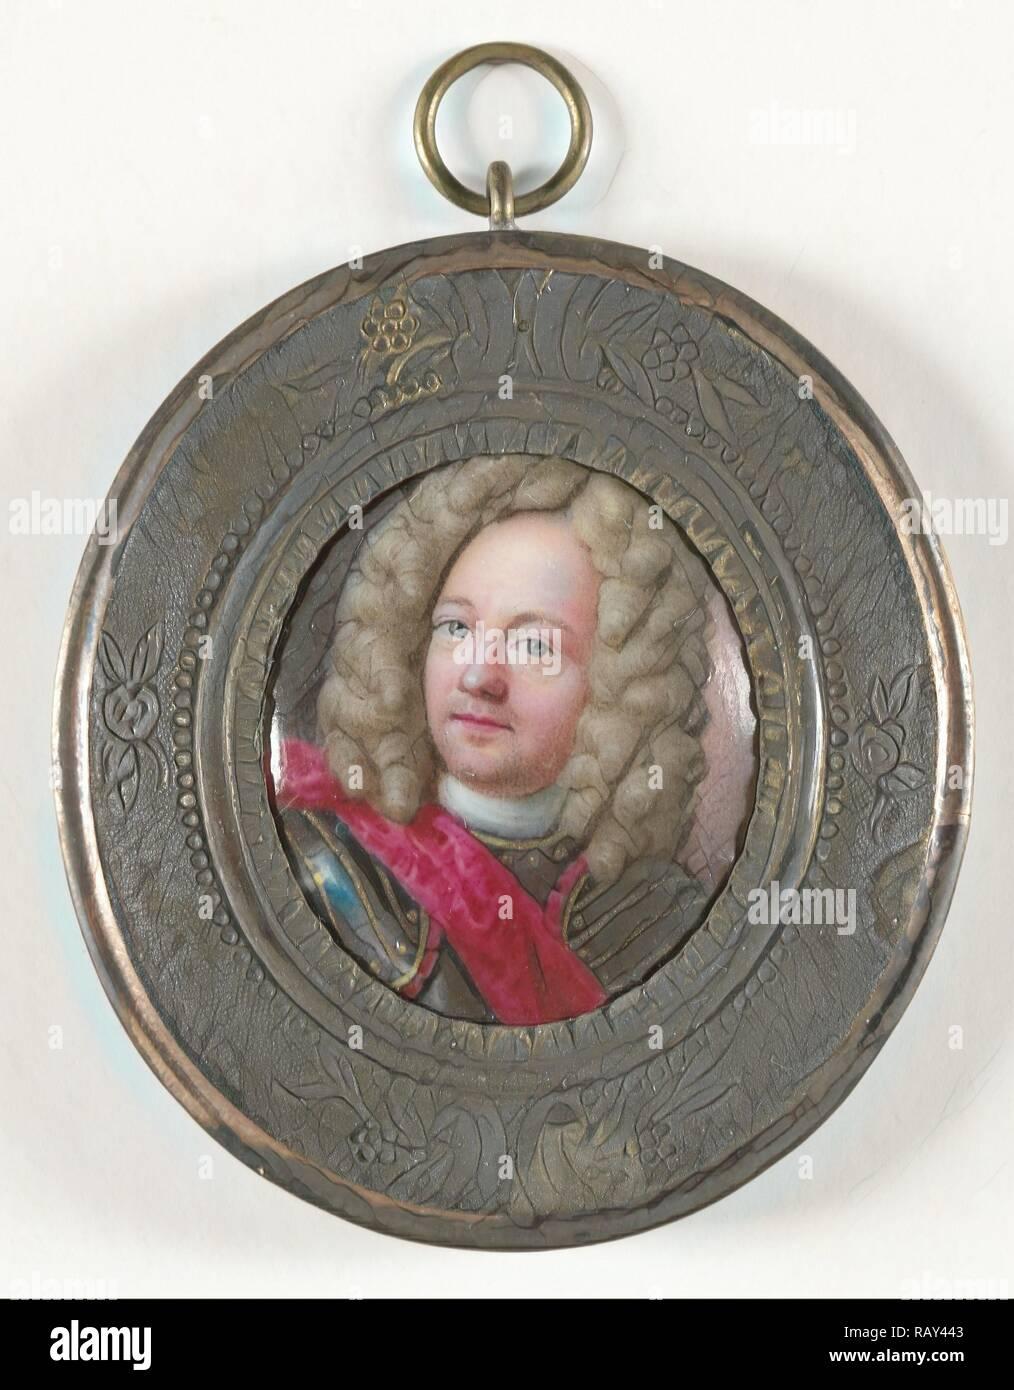 John Churchill, 1650-1722, Duke of Marlborough, attributed to Johann Friedrich Ardin, 1700 - 1725, Portrait miniature reimagined - Stock Image